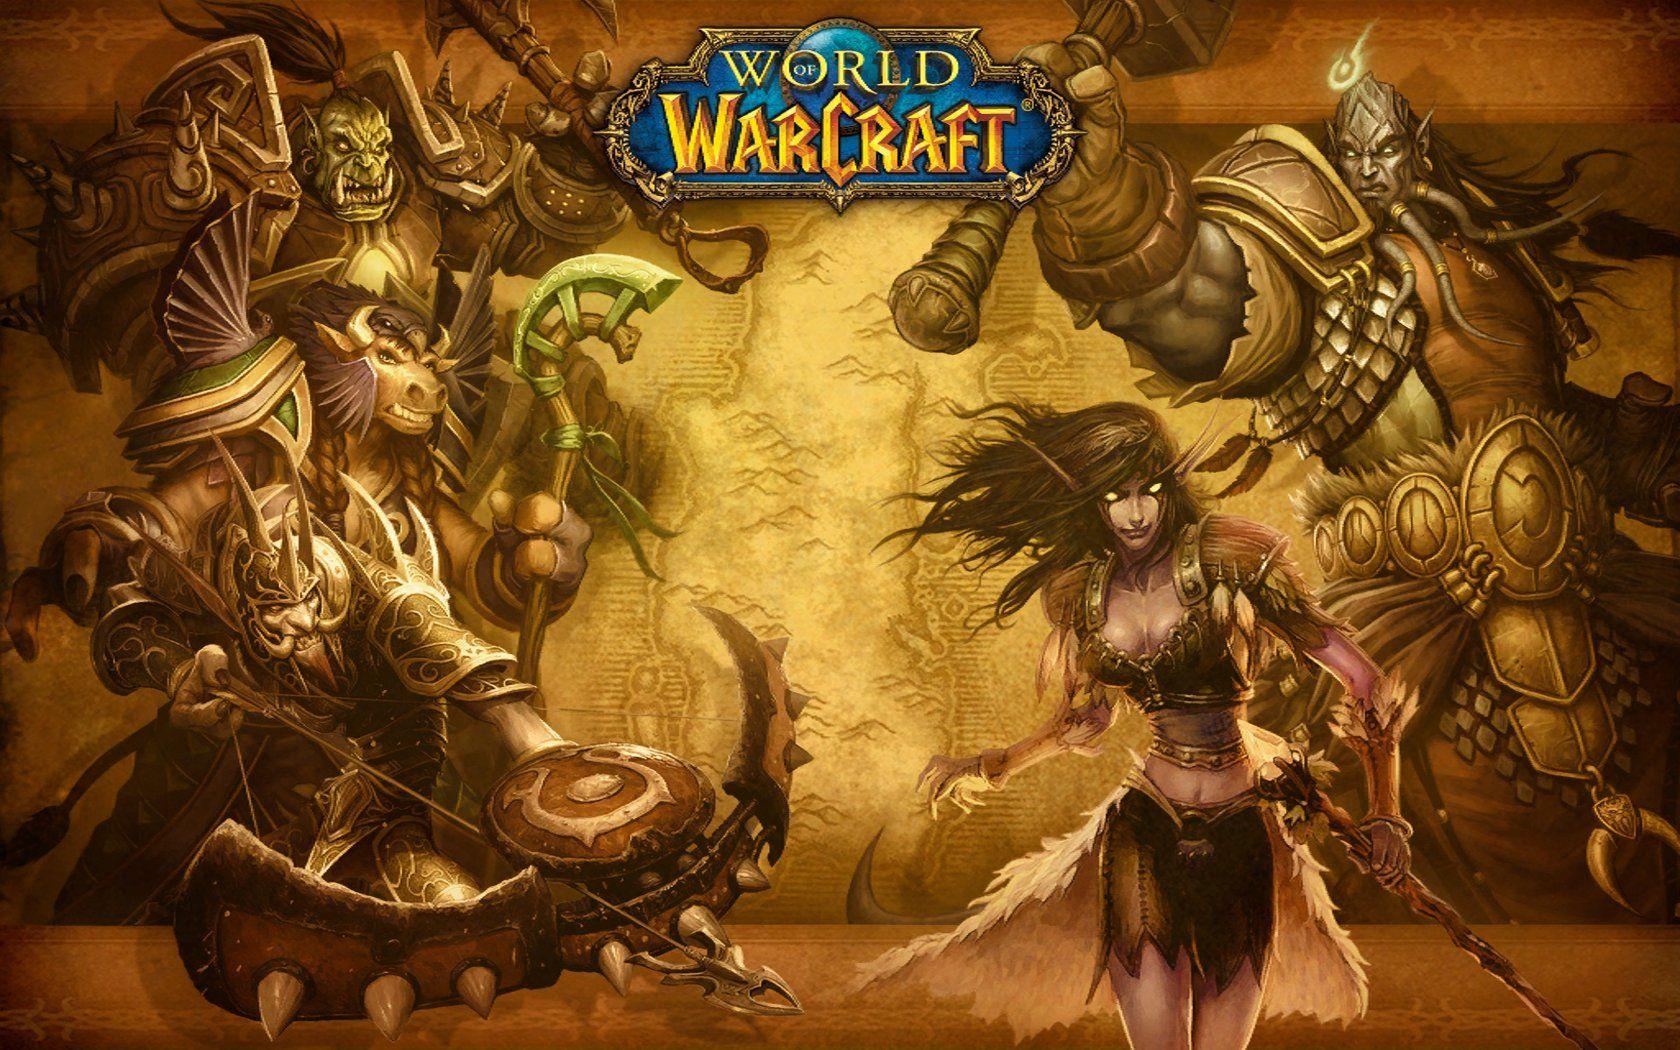 World Of Warcraft Female Goblin World Of Warcraft Cataclysm